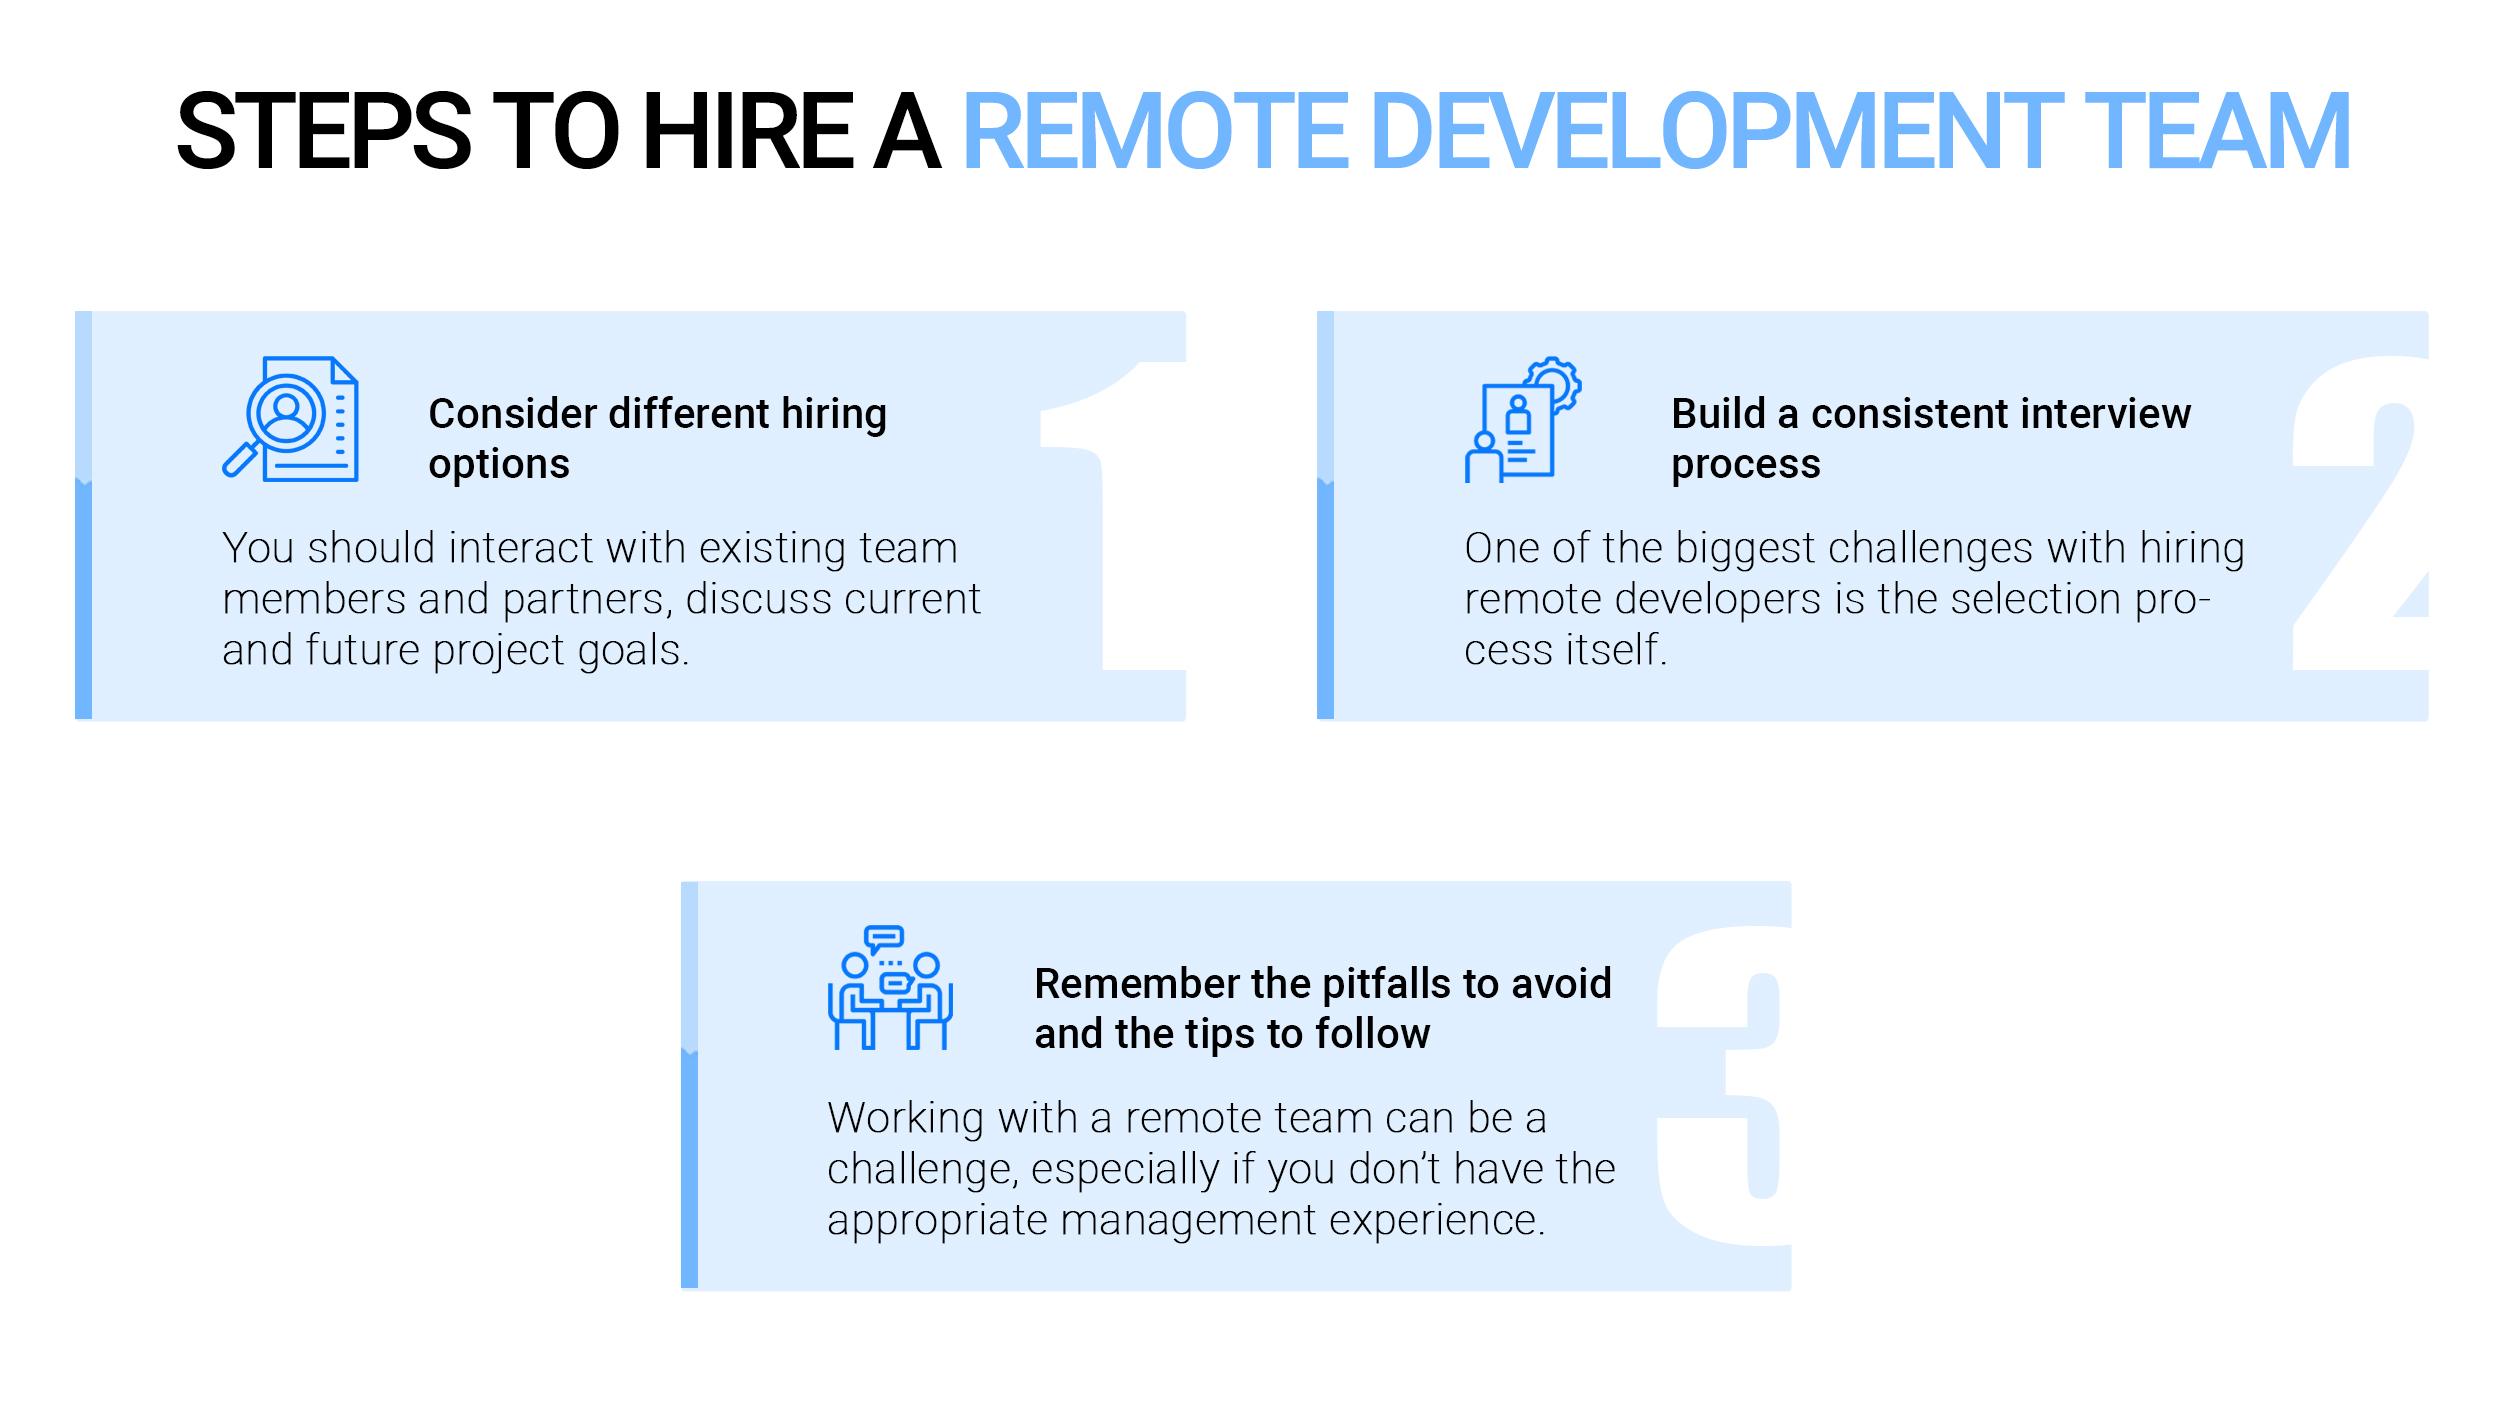 Steps to hire a remote development team